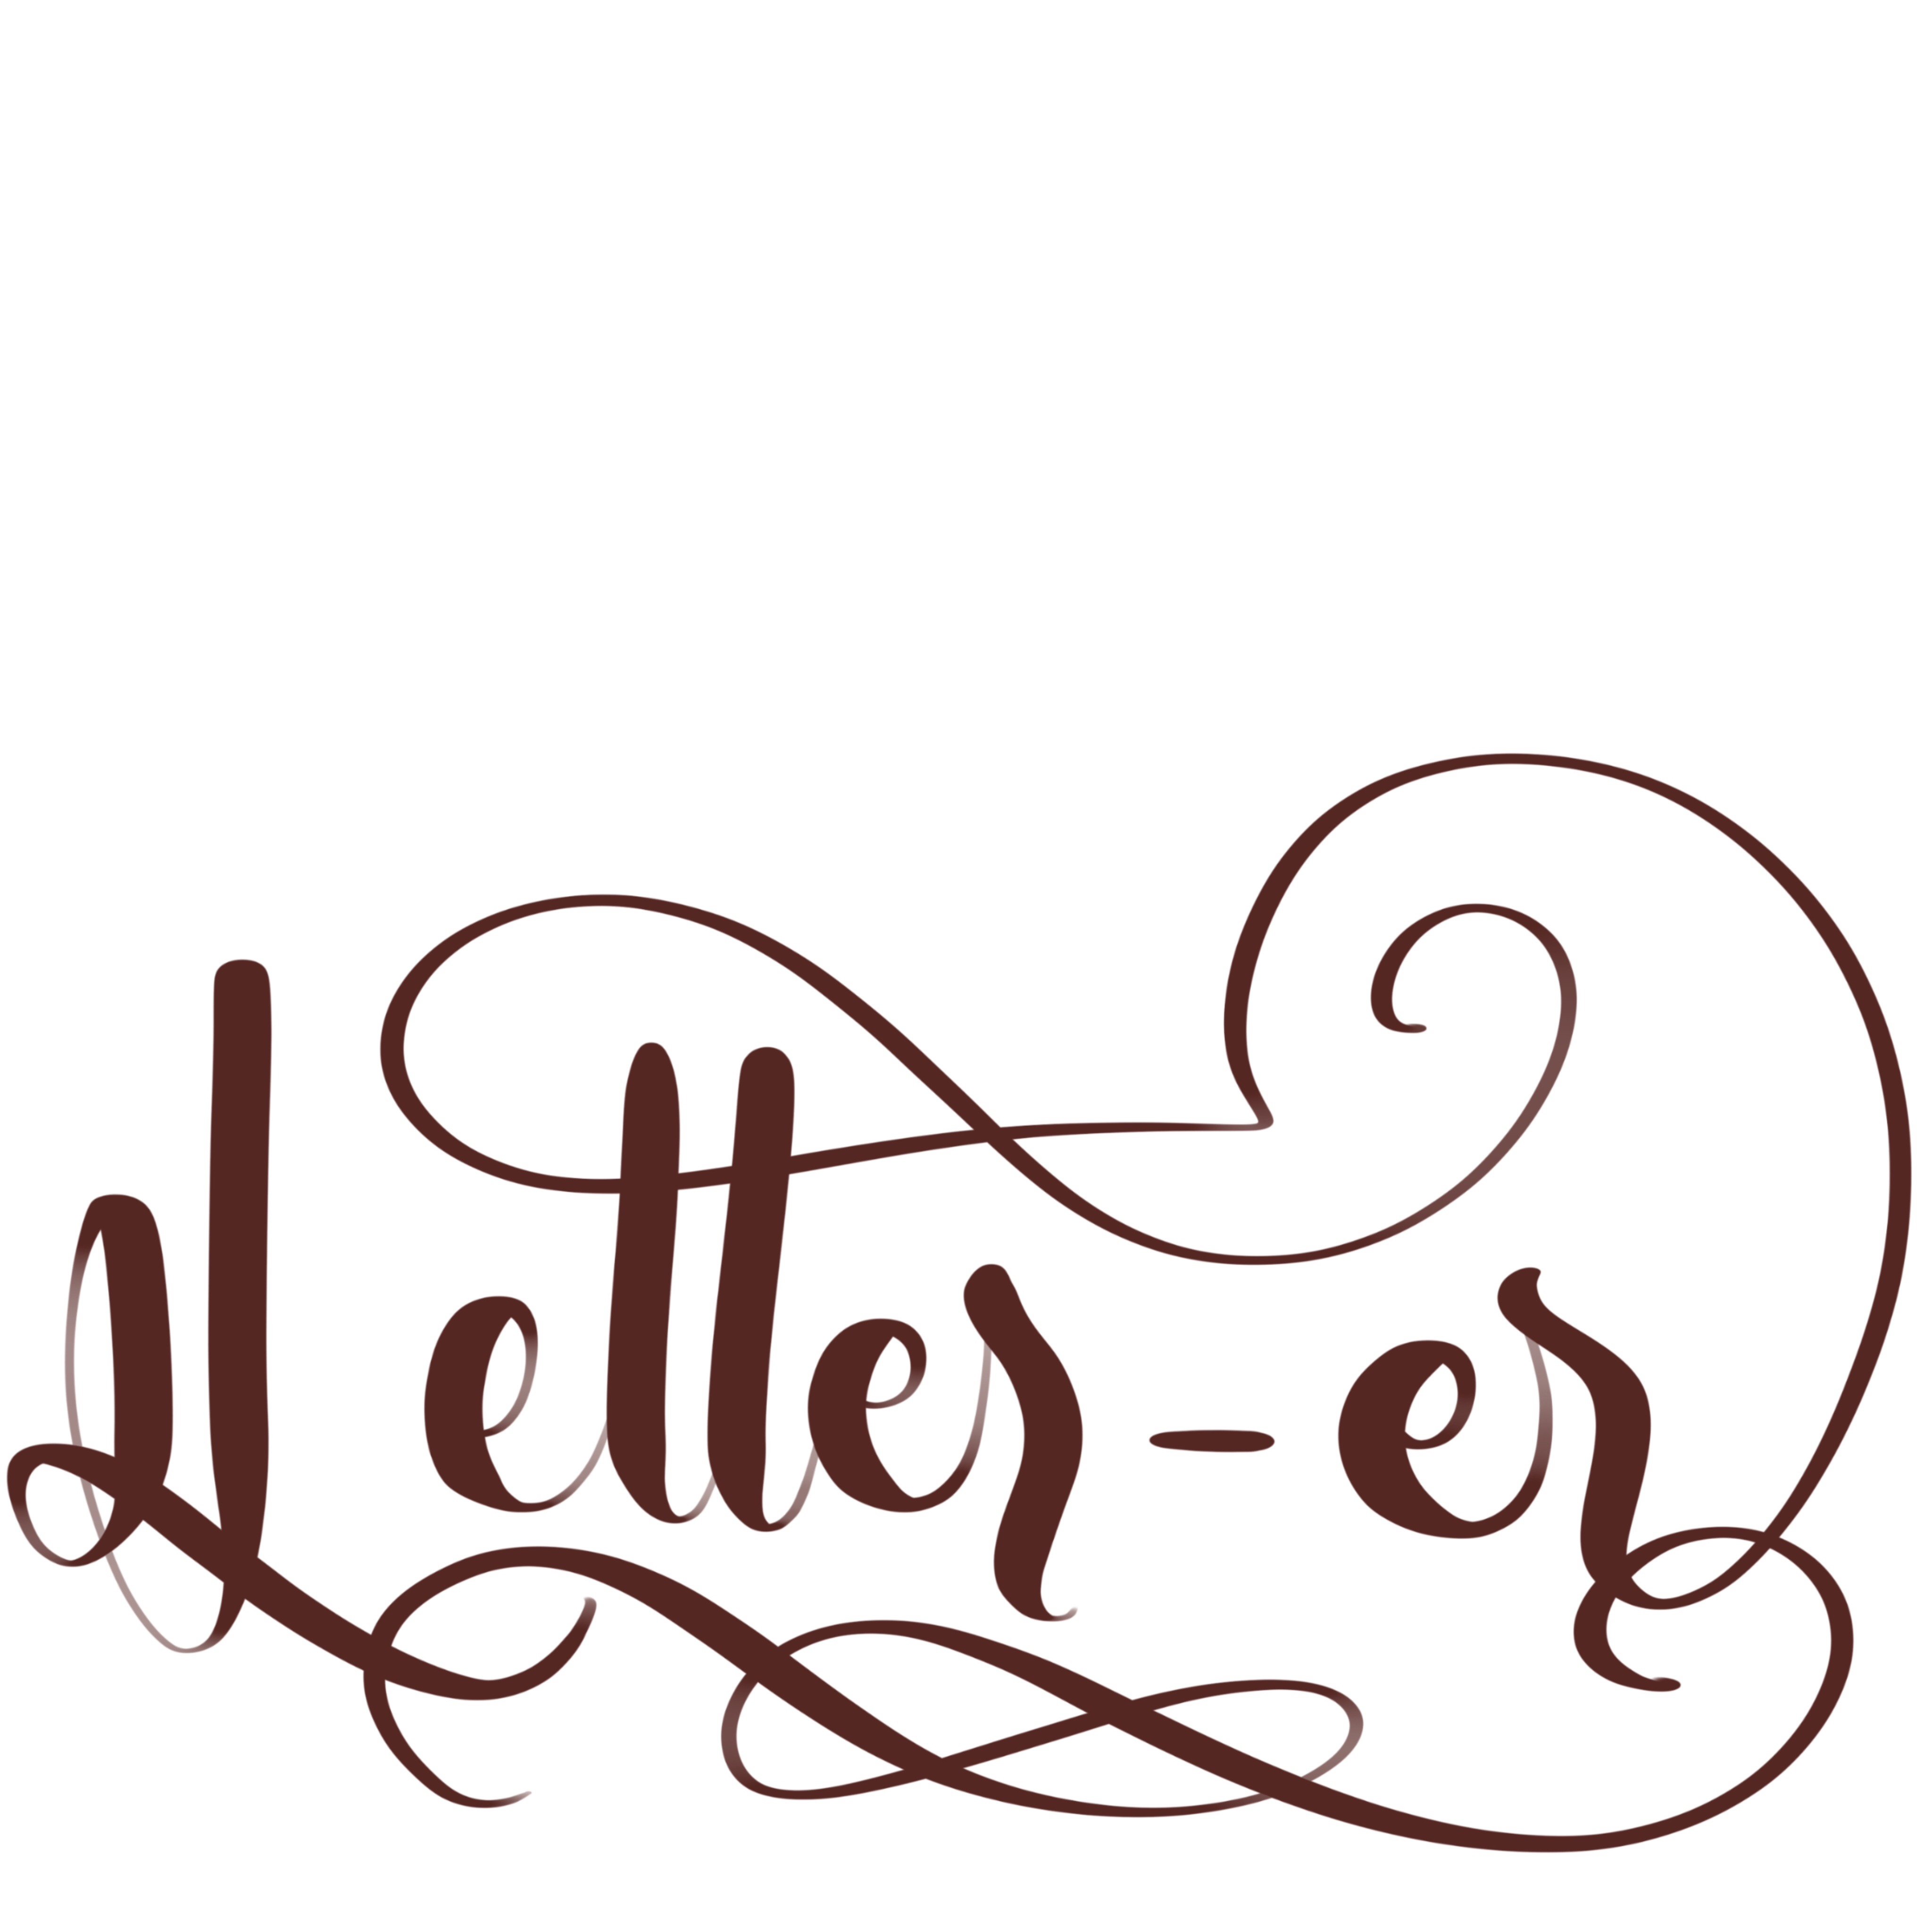 er letter